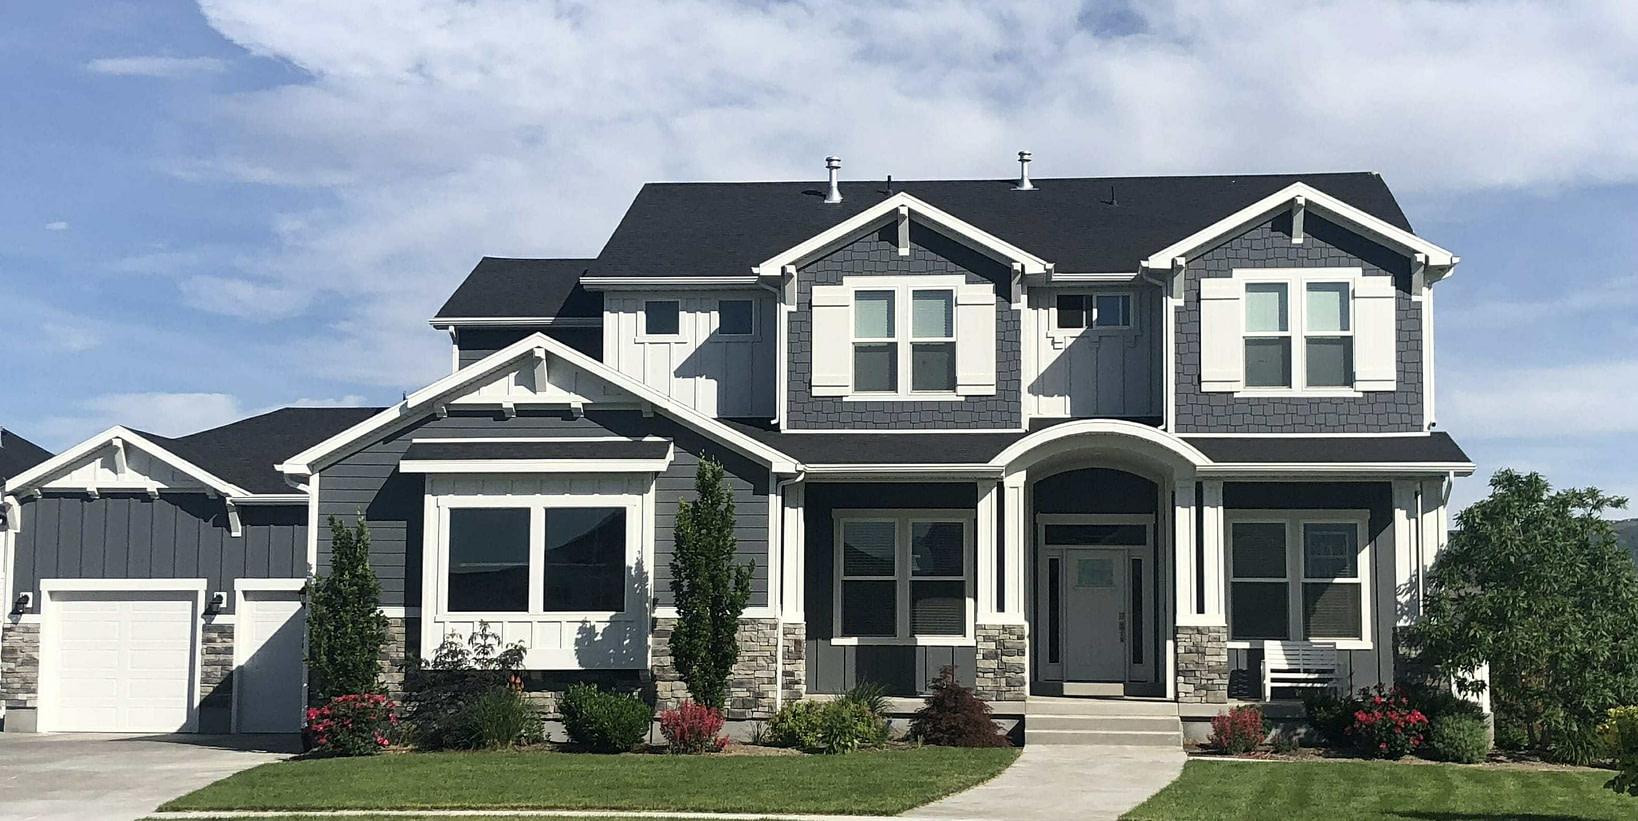 New Roof on Home in Alpine, Utah